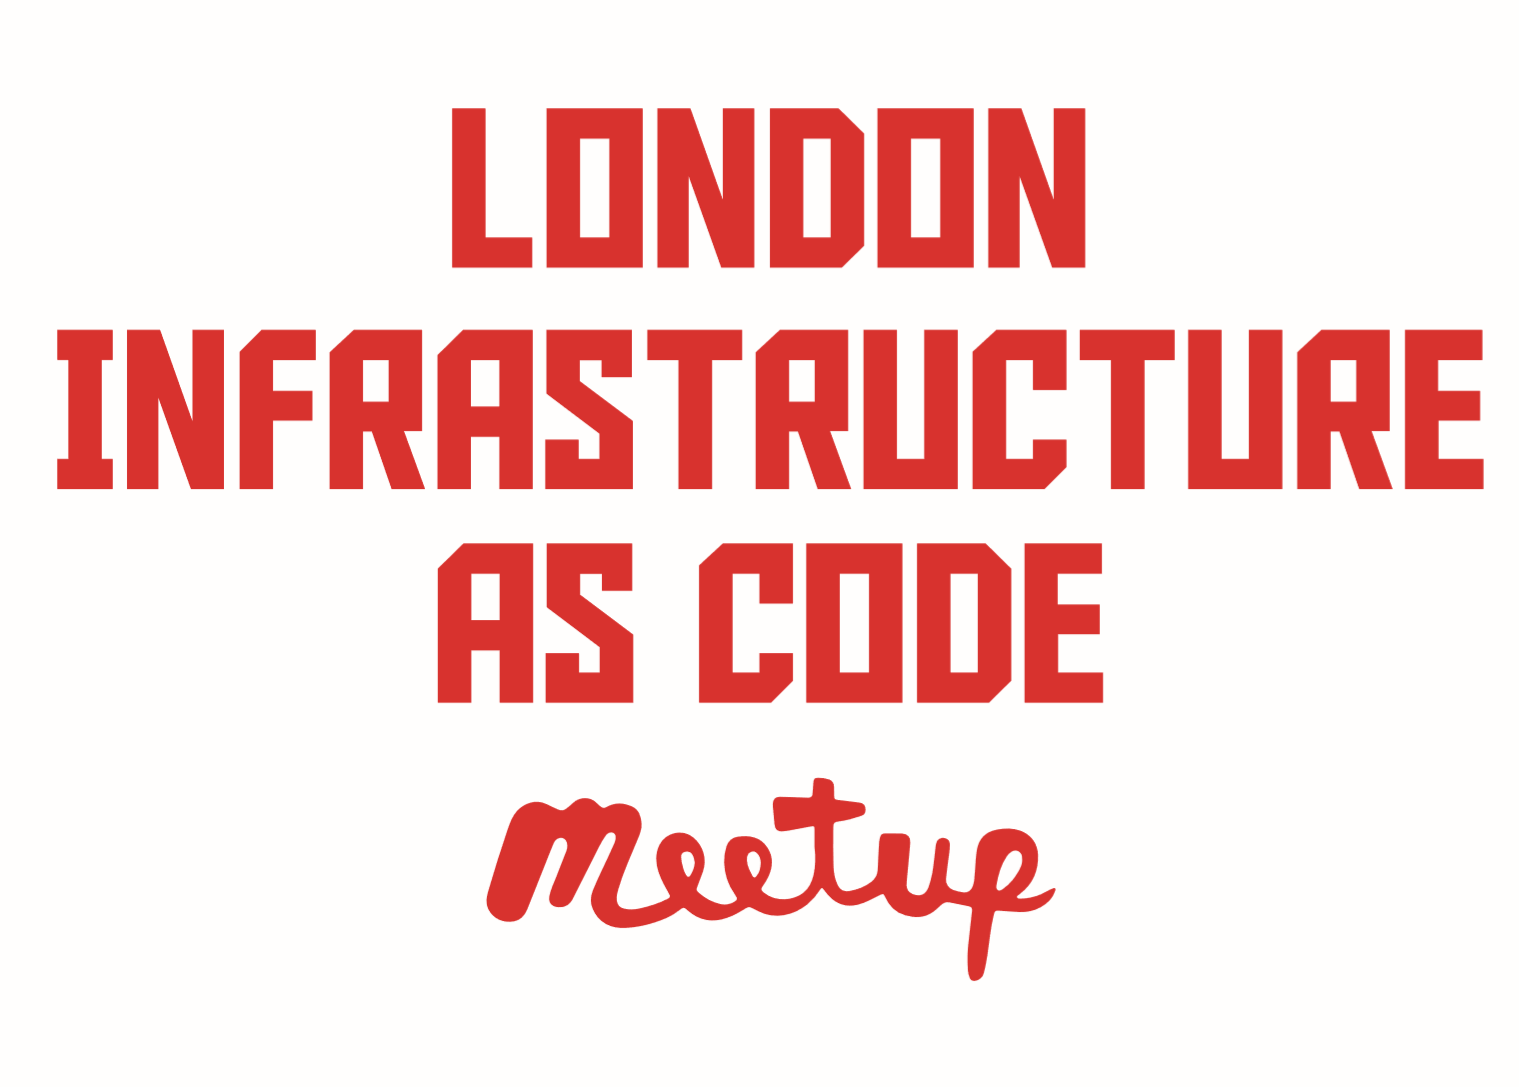 London Infrastructure As Code | Skills Matter Community